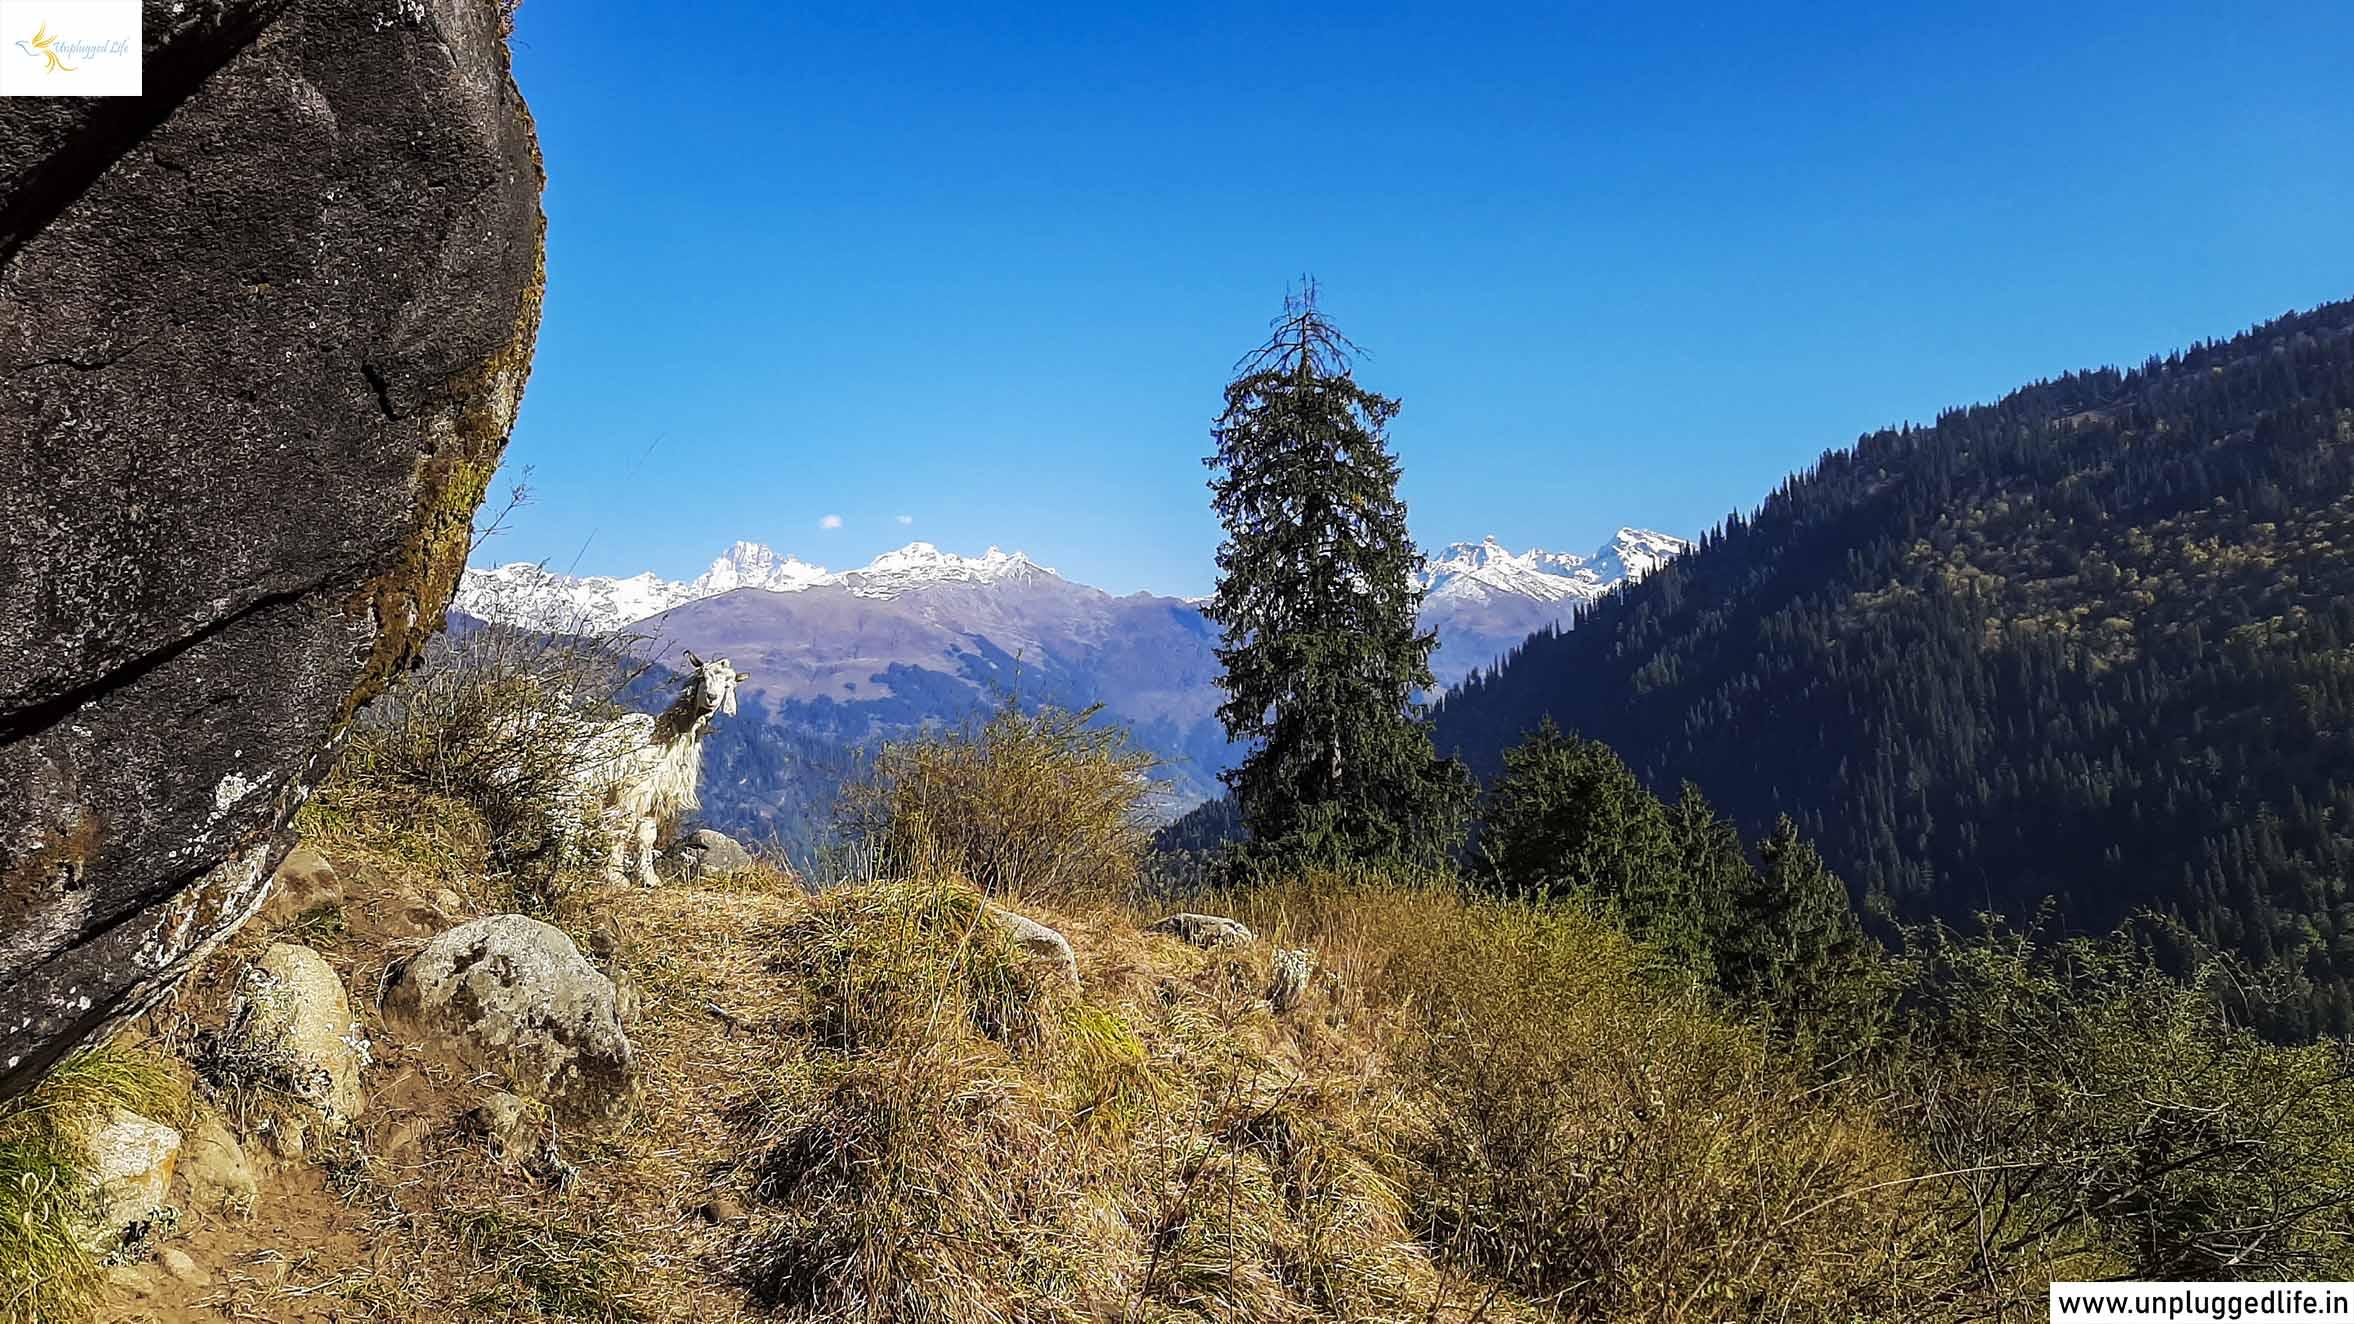 Manali, Chandigarh to Manali, Manali to Leh Ladakh, Manali to Jispa, Himachal Pradesh, Himalayas, Manali to Keylong, Manali to Sarchu, Jispa to Sarchu, Keylong to Sarchu, Manali to Rohtang Pass, Chandigarh to Leh Ladakh, Ladakh by Road, Ladakh Overland, Drive to Leh Ladakh, Leh Ladakh Tour Package, Ladakh Tour, Mountain View, View of Himalaya